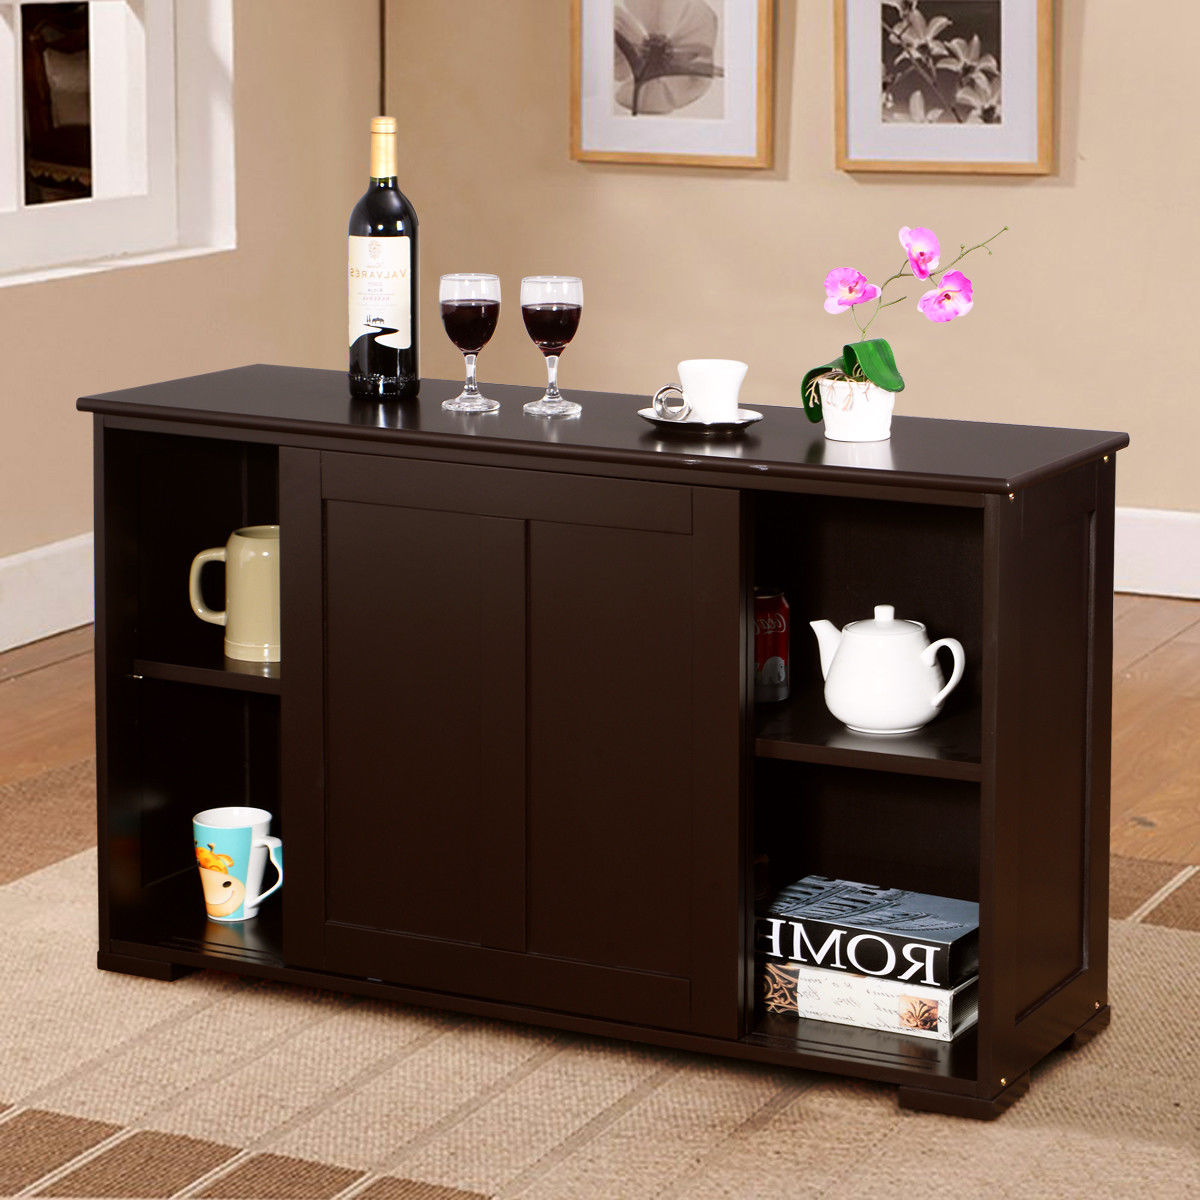 Costway Kitchen Storage Cabinet Sideboard Buffet Cupboard Wood Sliding Door Pantry by Costway